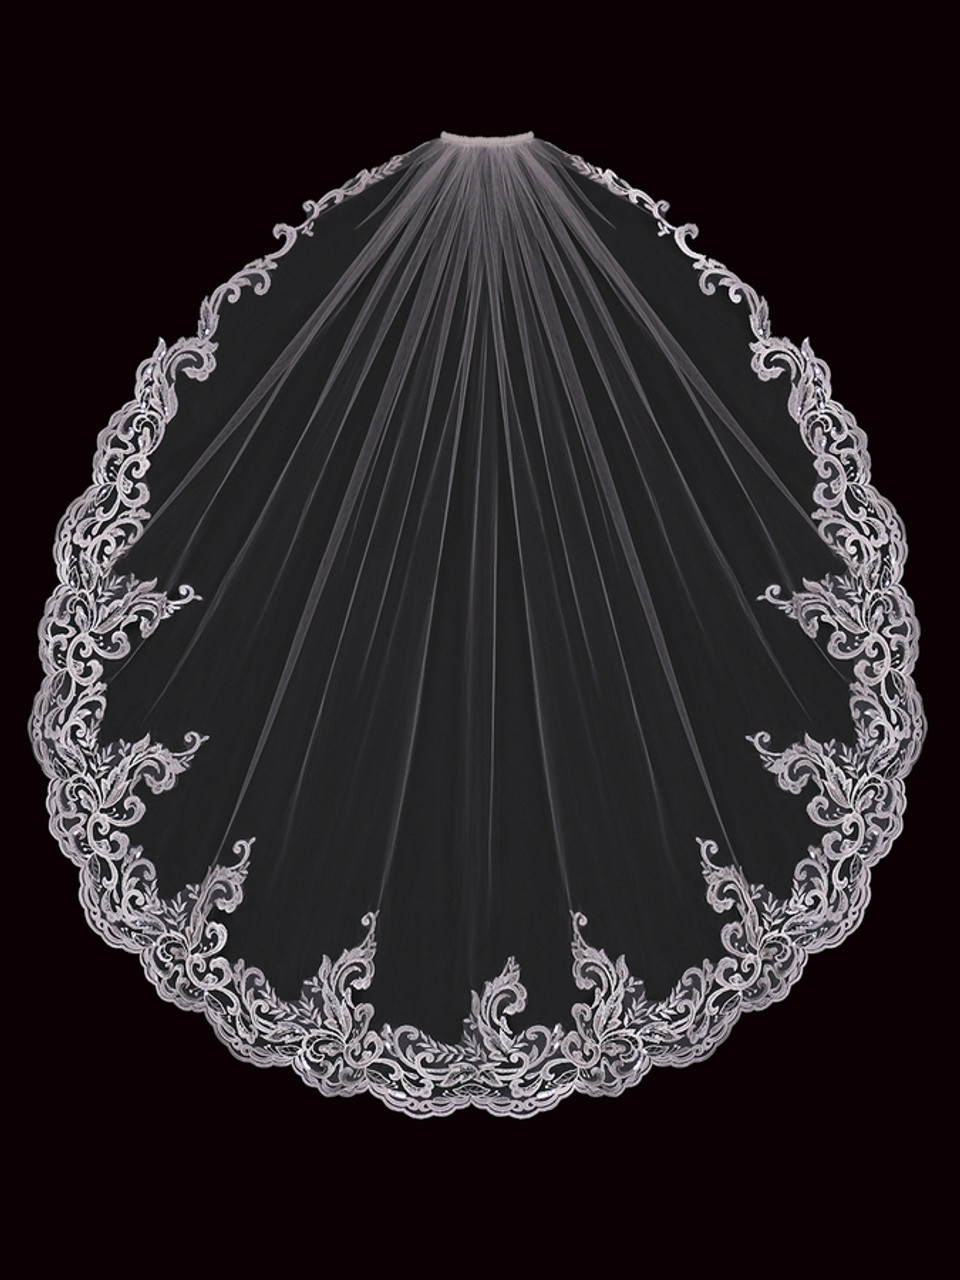 En Vogue Bridal Style V2199SF - English Tulle Fingertip Veil - One Tier